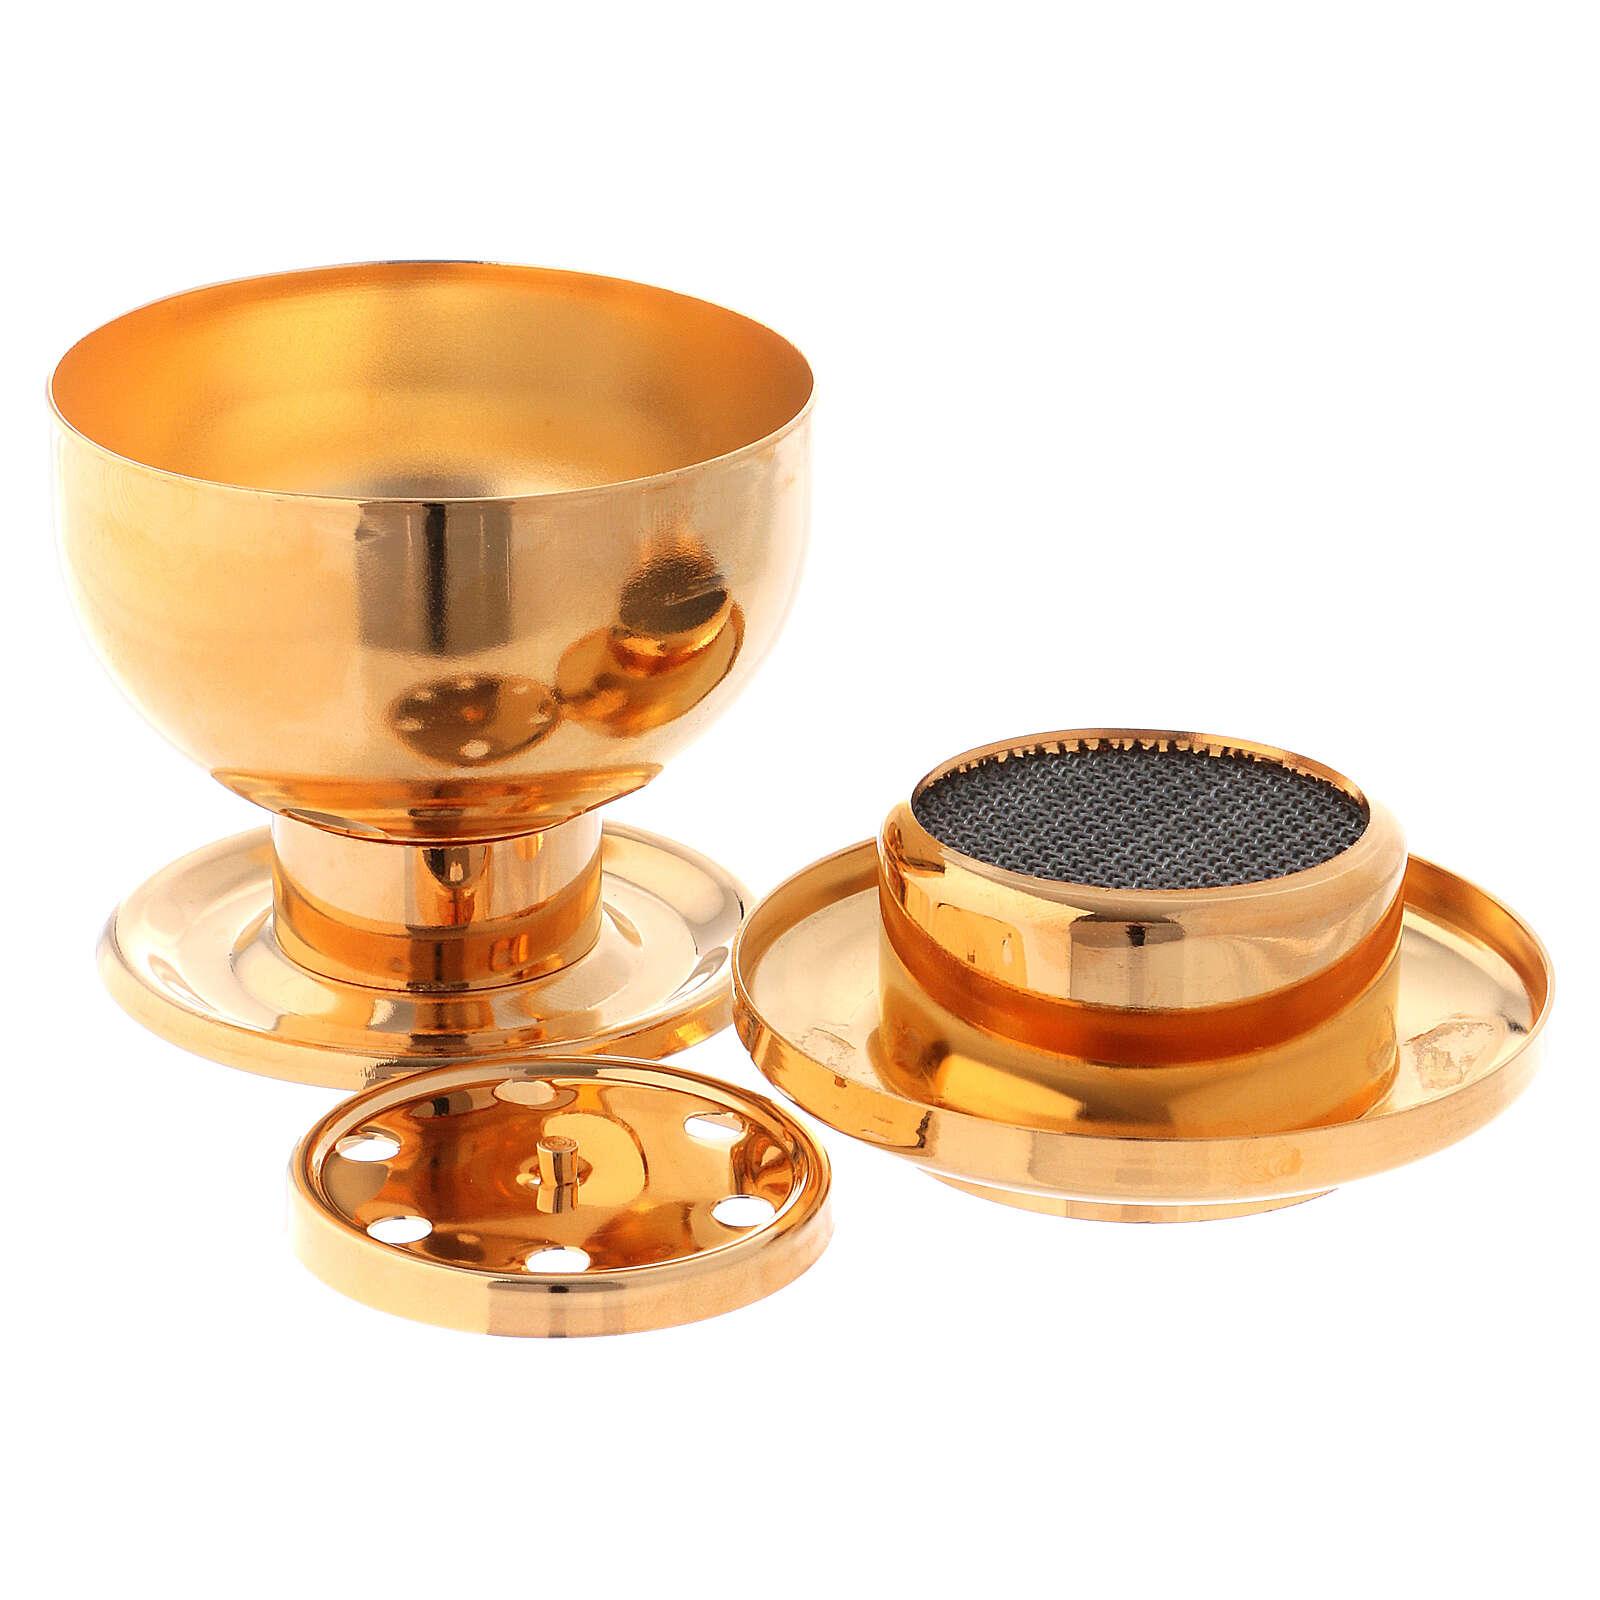 Gold plated incense burner for charcoal 3